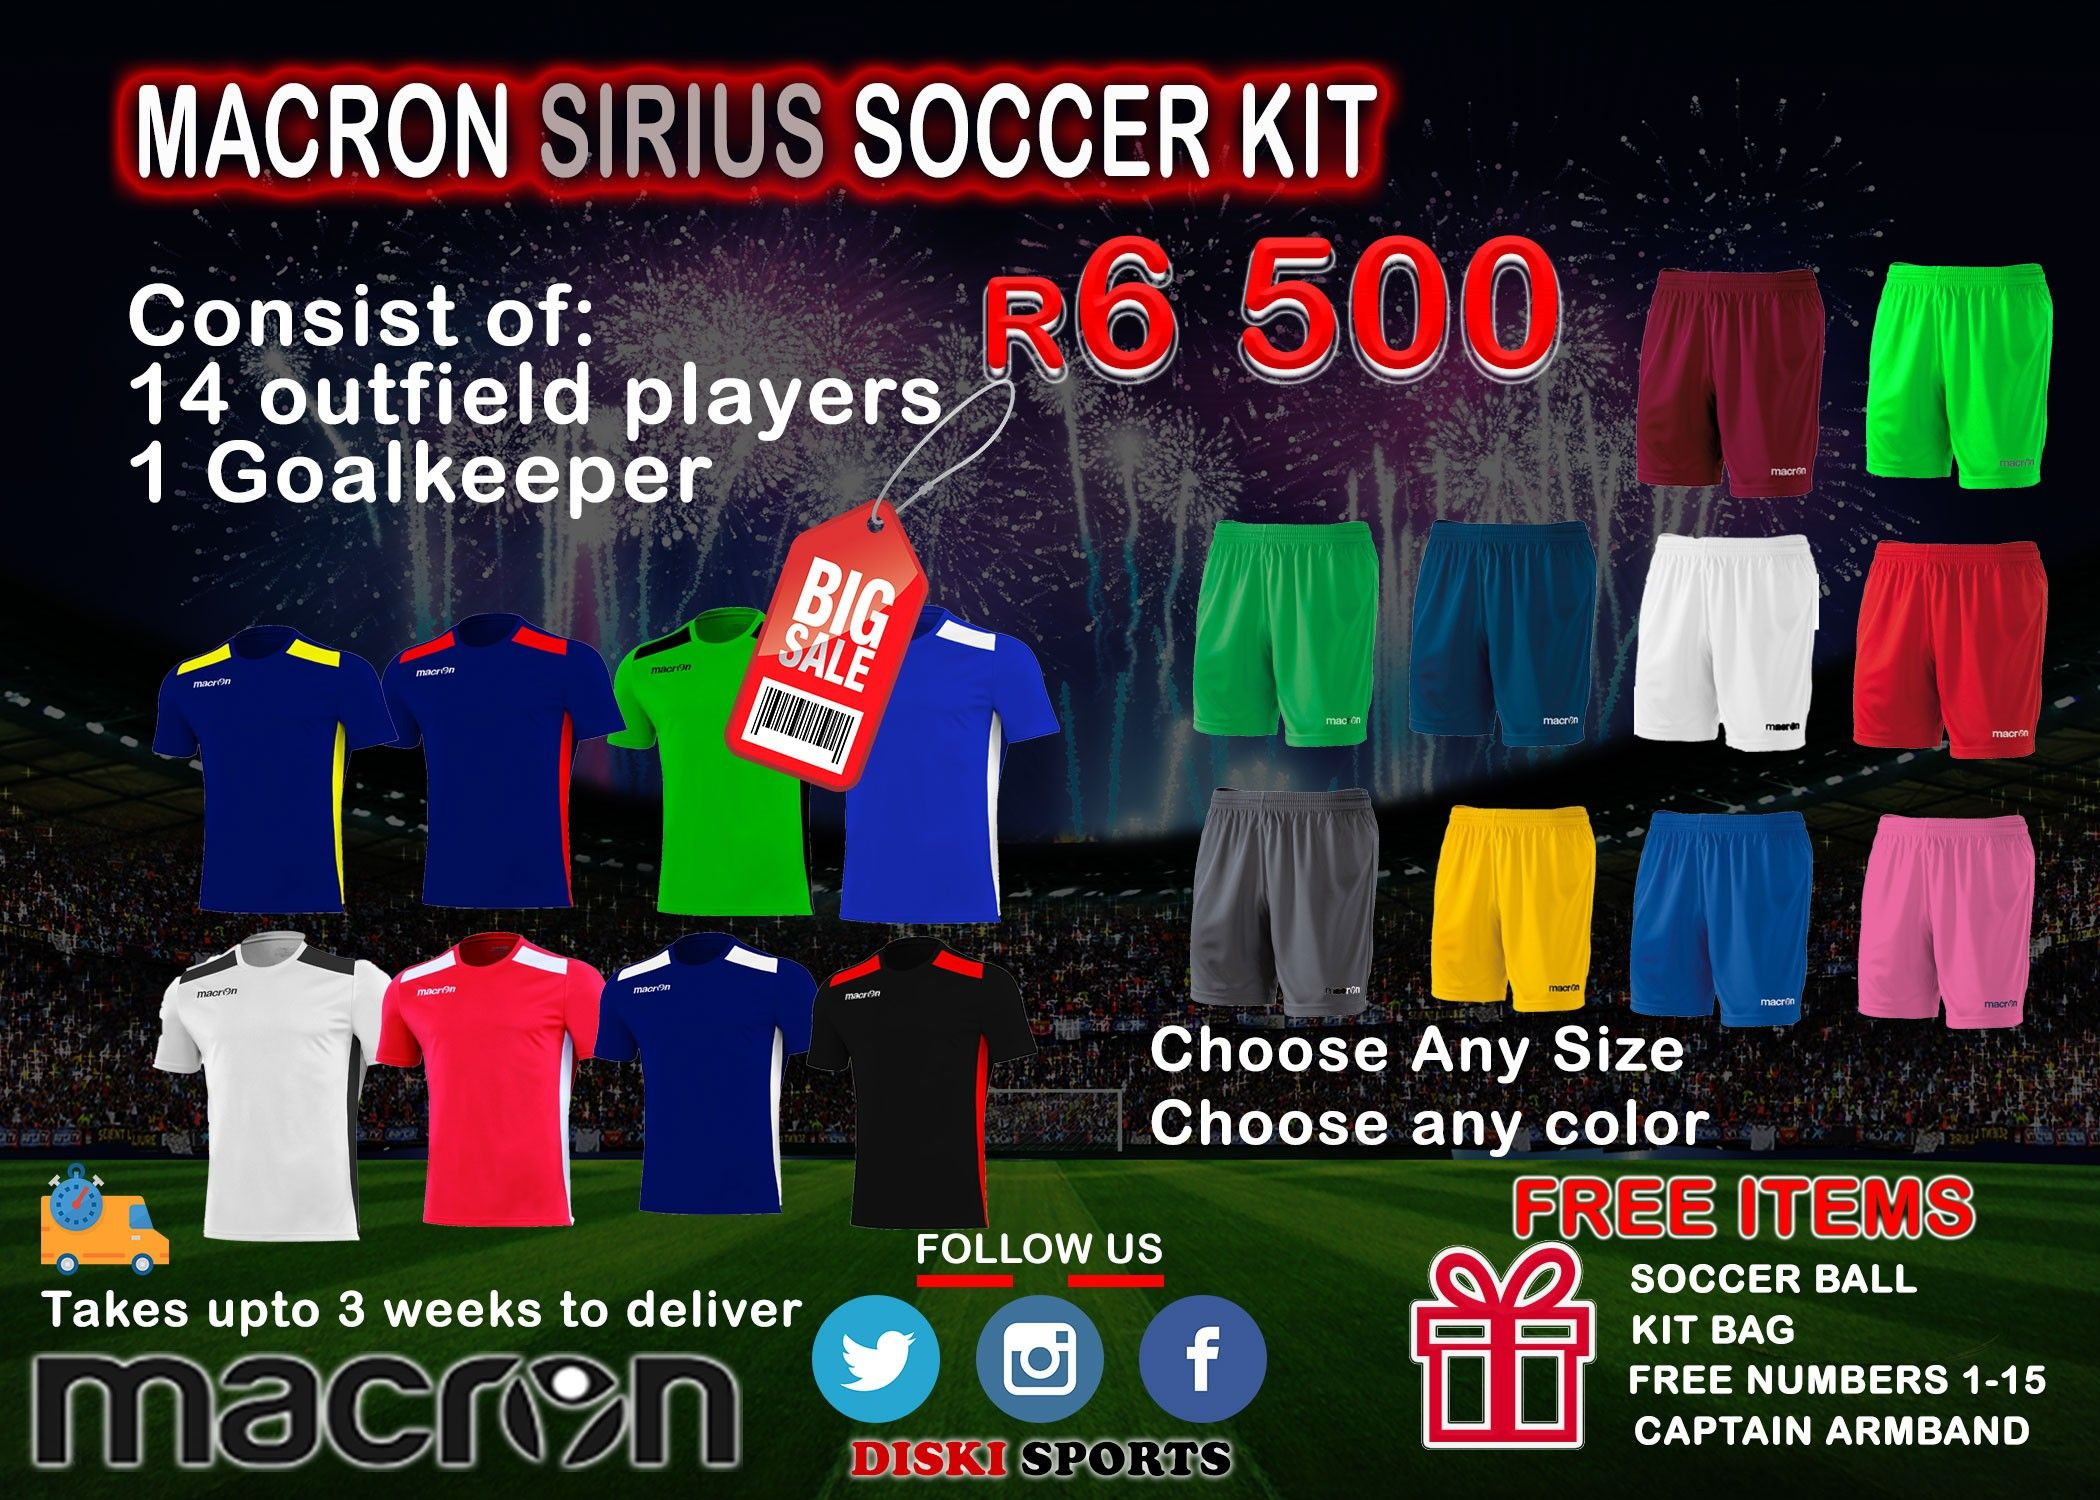 Buy Macron Soccer Kit At Diski Sports Www Diskisports Co Za Soccer Kits Soccer Football Kits